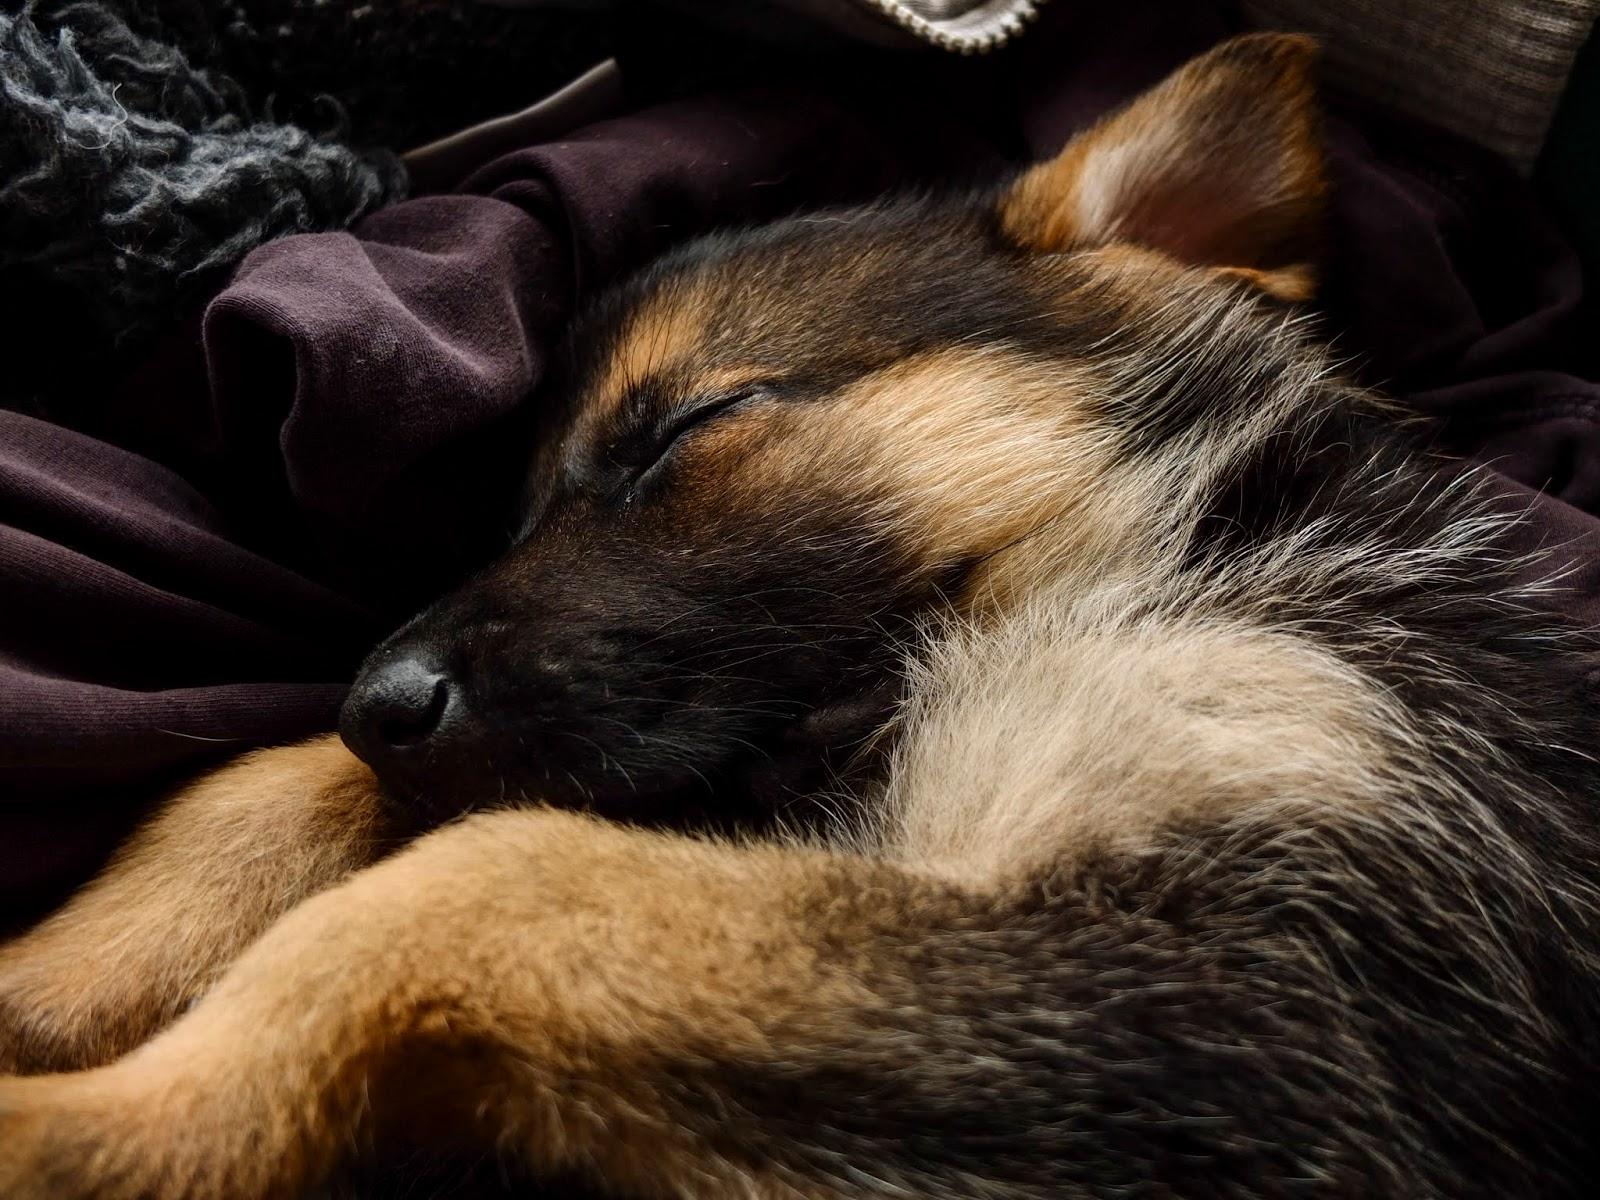 A 6 weeks old German Shepherd pup Nala sleeping.